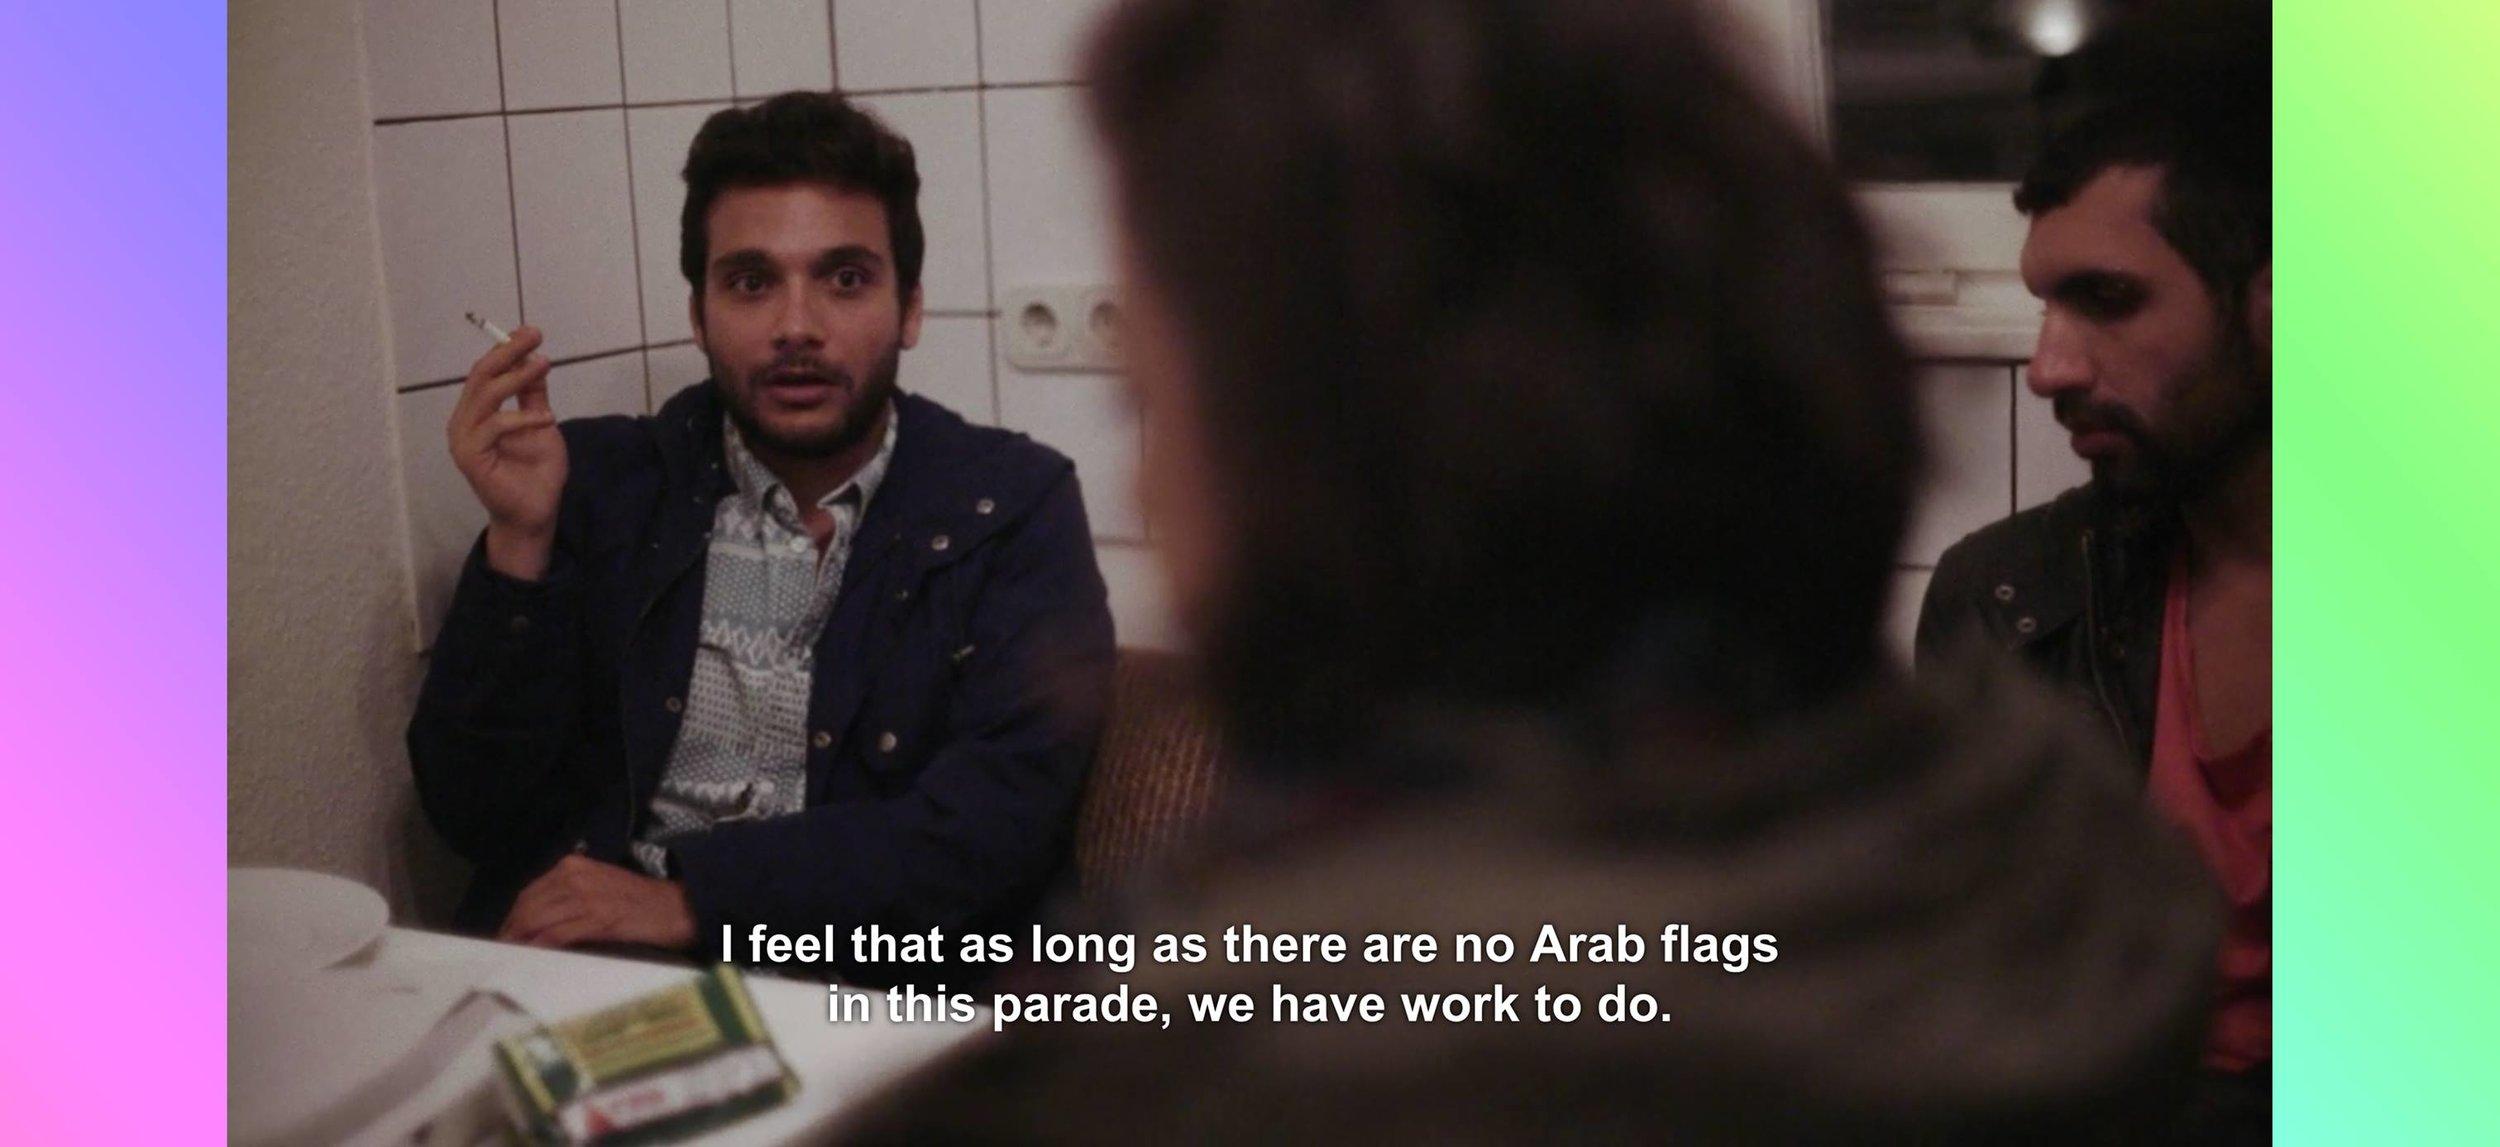 Pride of Arabia March London Pride - saturday 07.08.2017, London